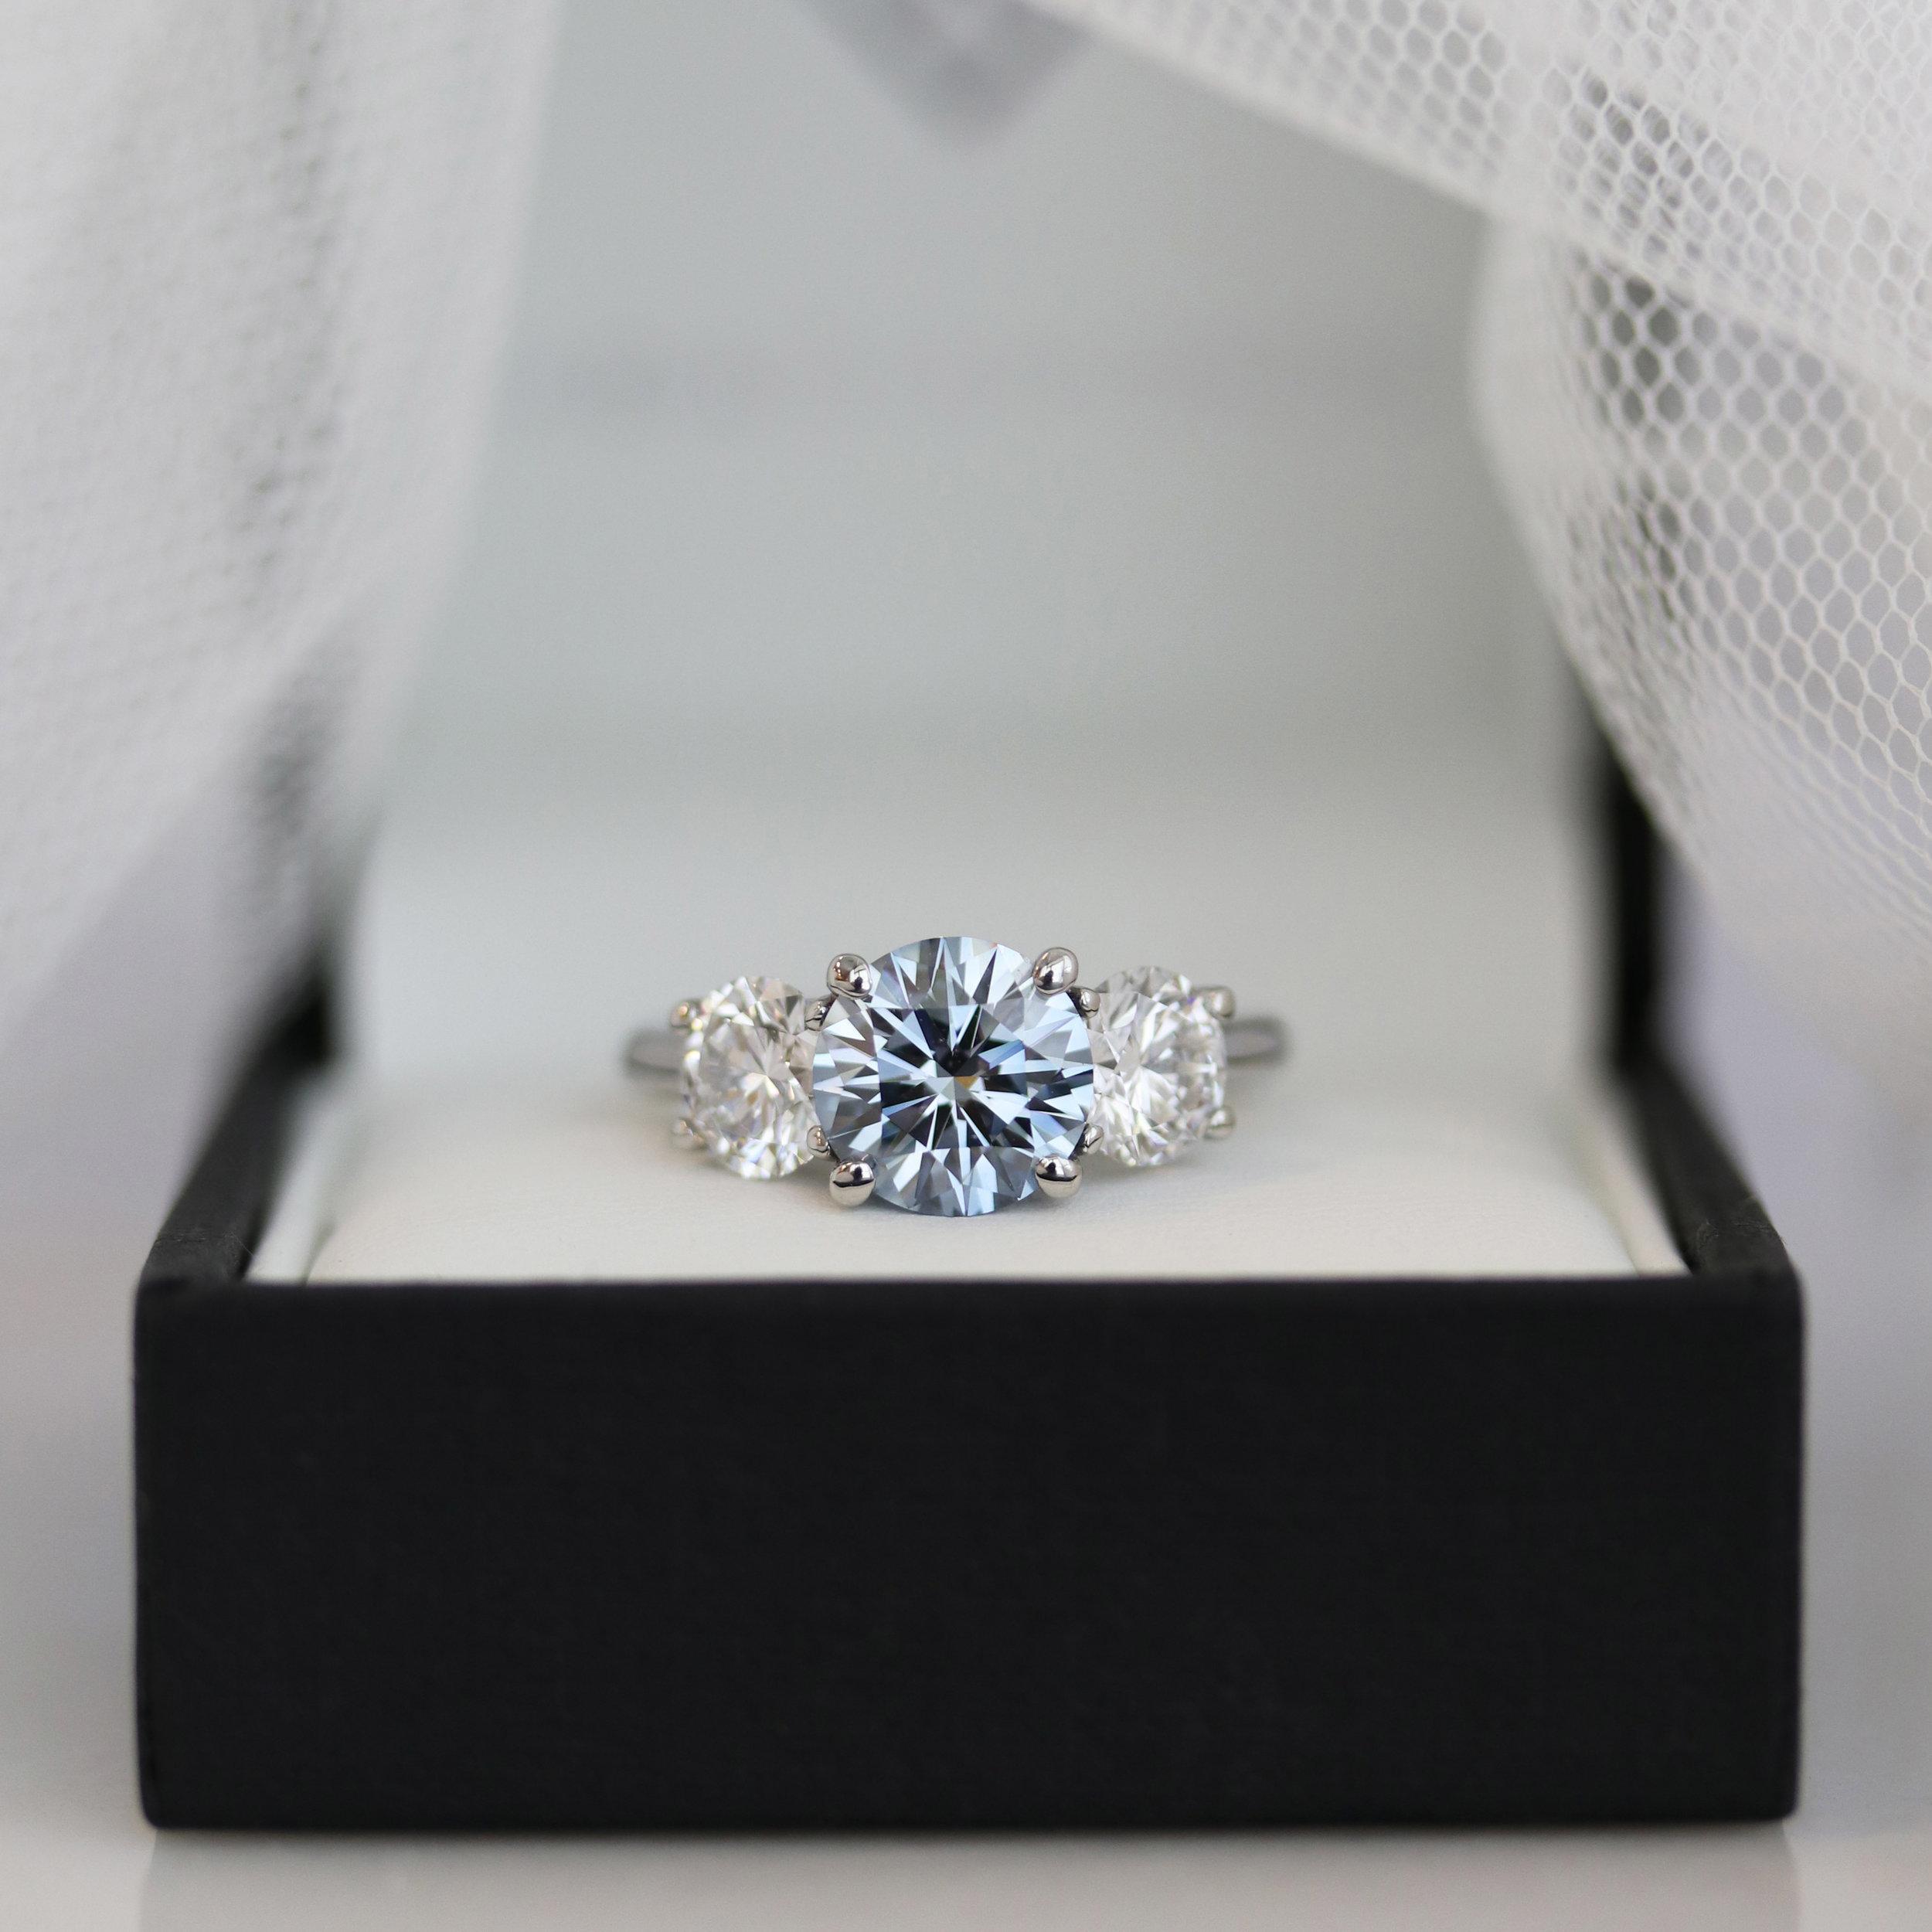 AD-070 Round Three Stone Blue Lab Diamond Engagement Ring